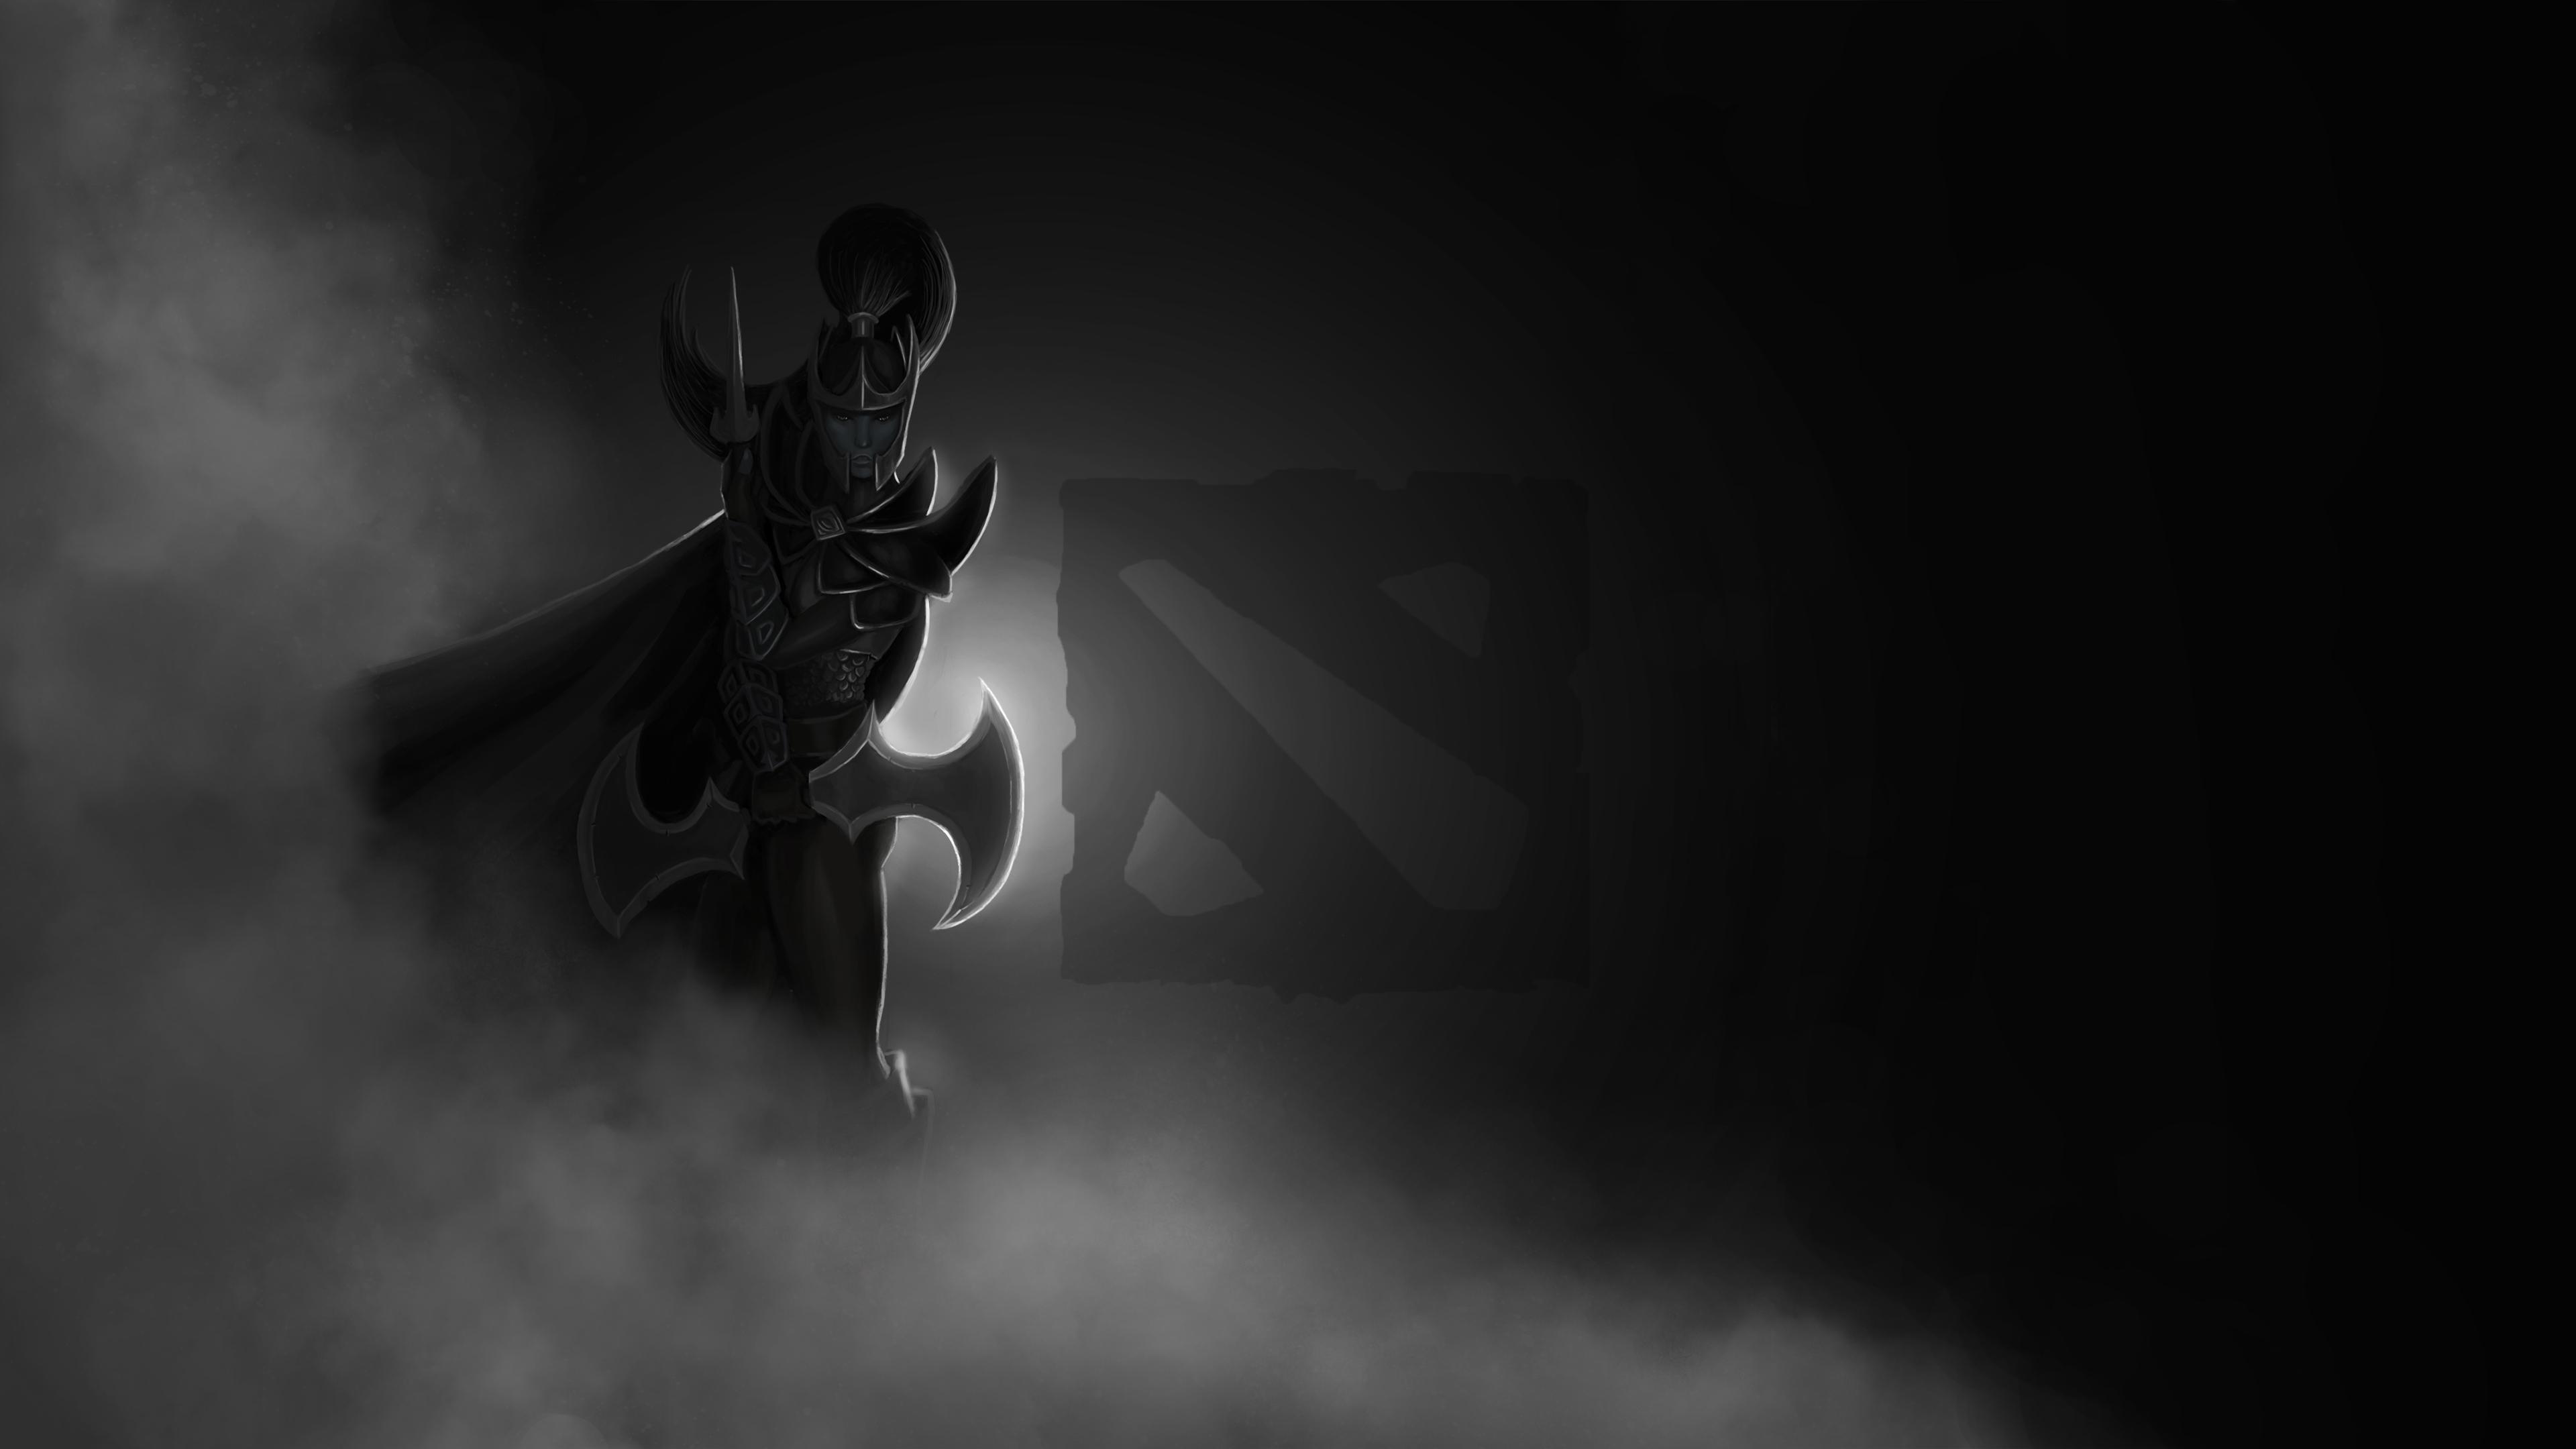 Character Black Fog Cool